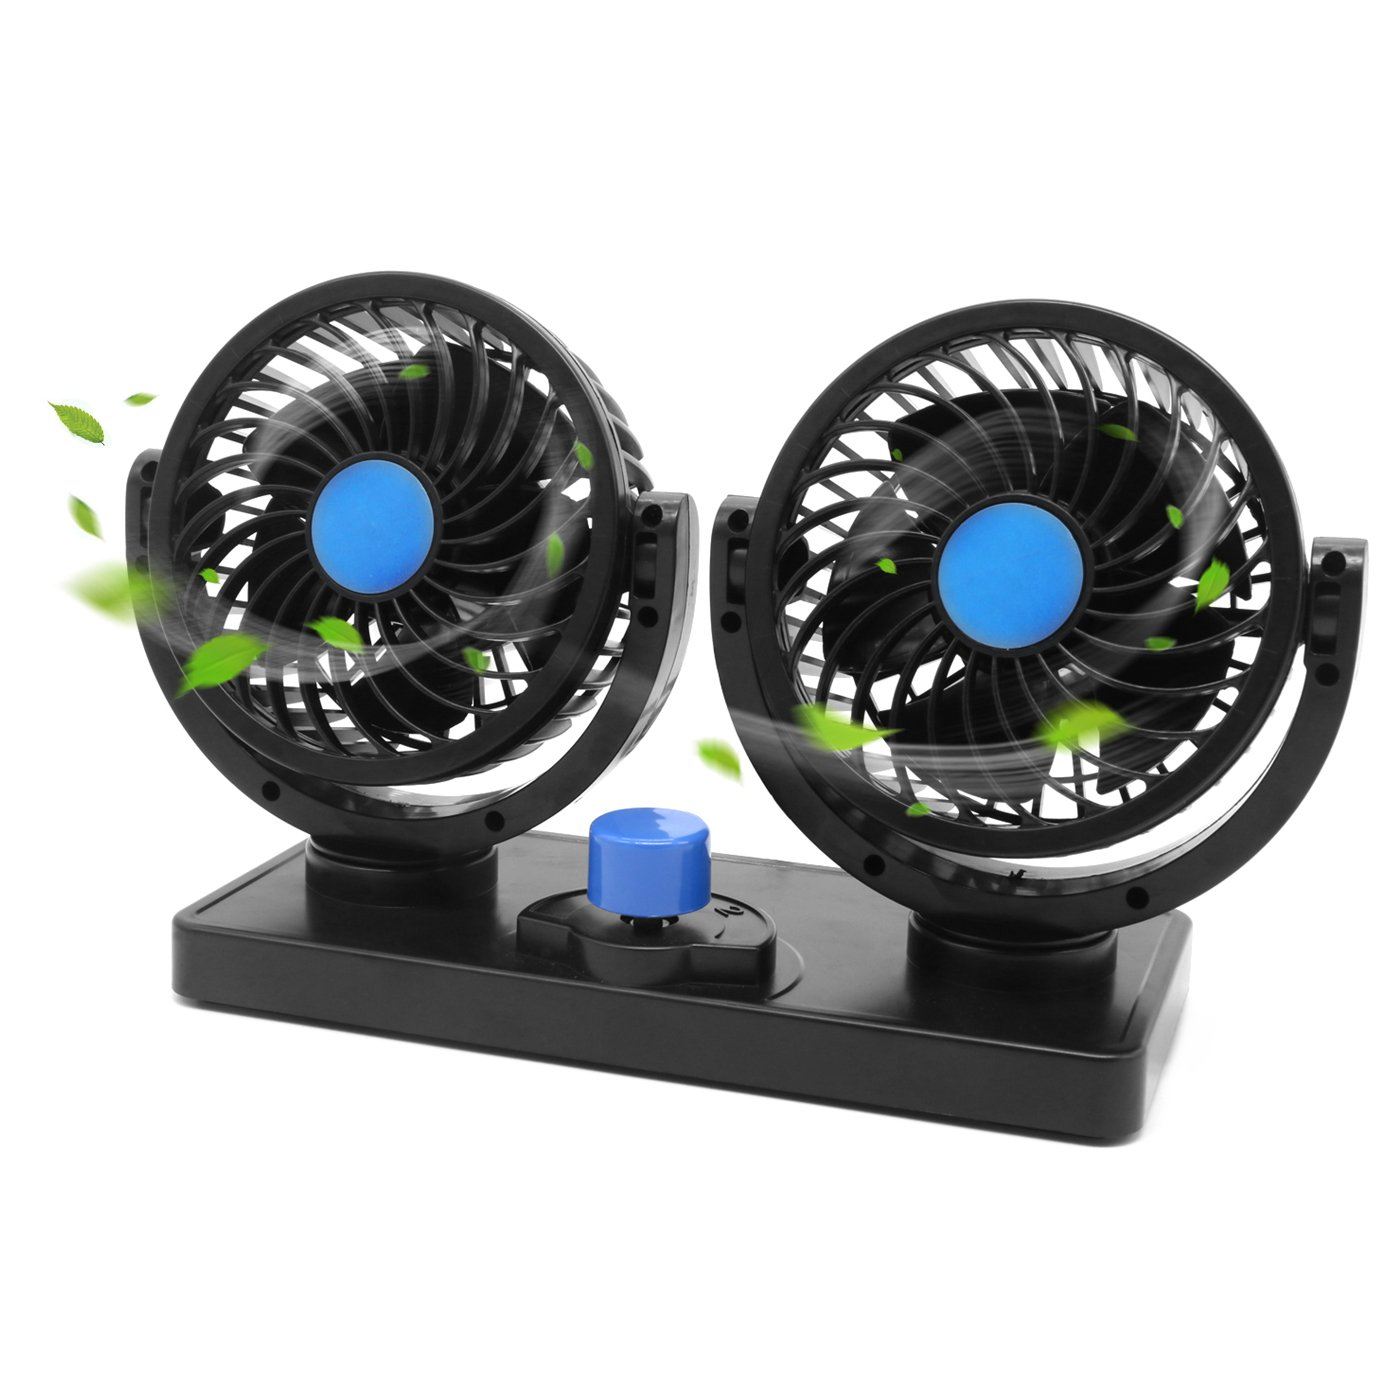 Ventilador de coche de 12 V giratorio 360 ajustable de doble cabeza ventilador de coche potente silencioso 2 velocidades giratorio ventilación salpicadero eléctrico coche ventiladores de verano refrigeración aire circulador China